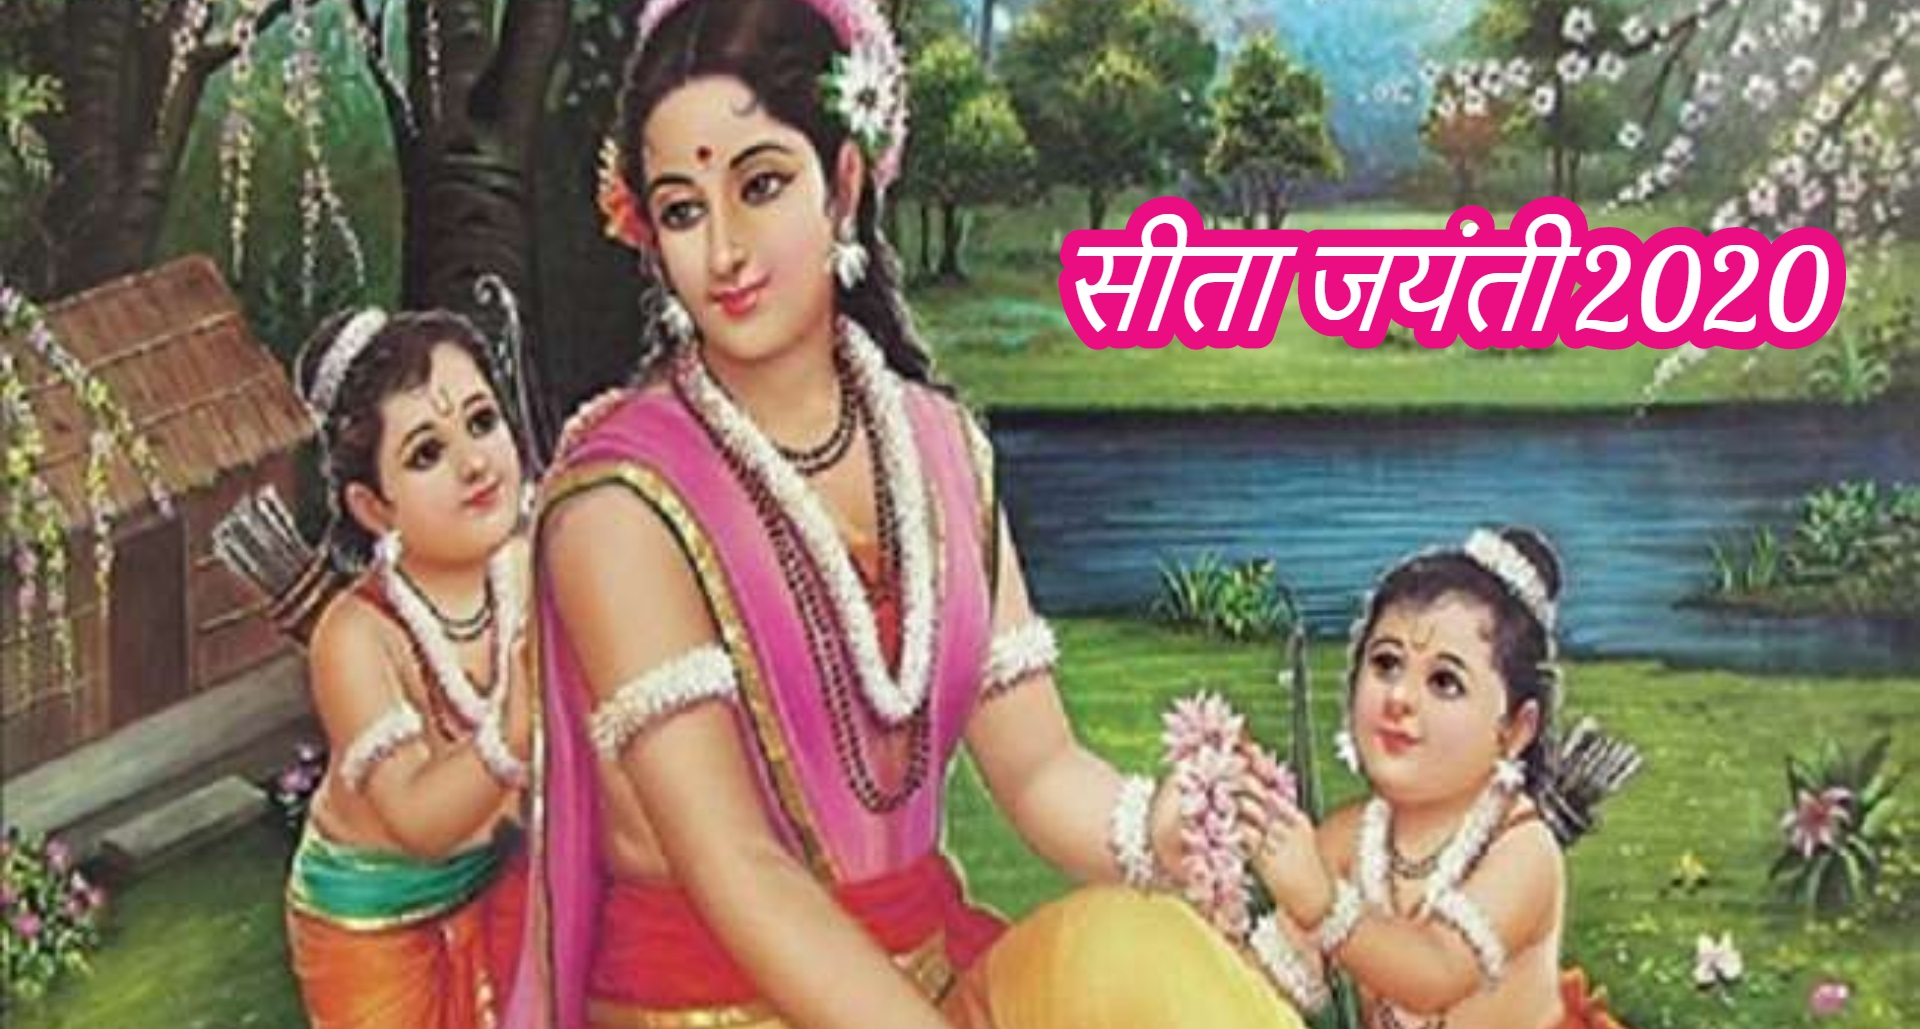 Sita Jayanti 2020: Sita Jayanti is very important in Hindu religion, that's why Suhagan women keep fast